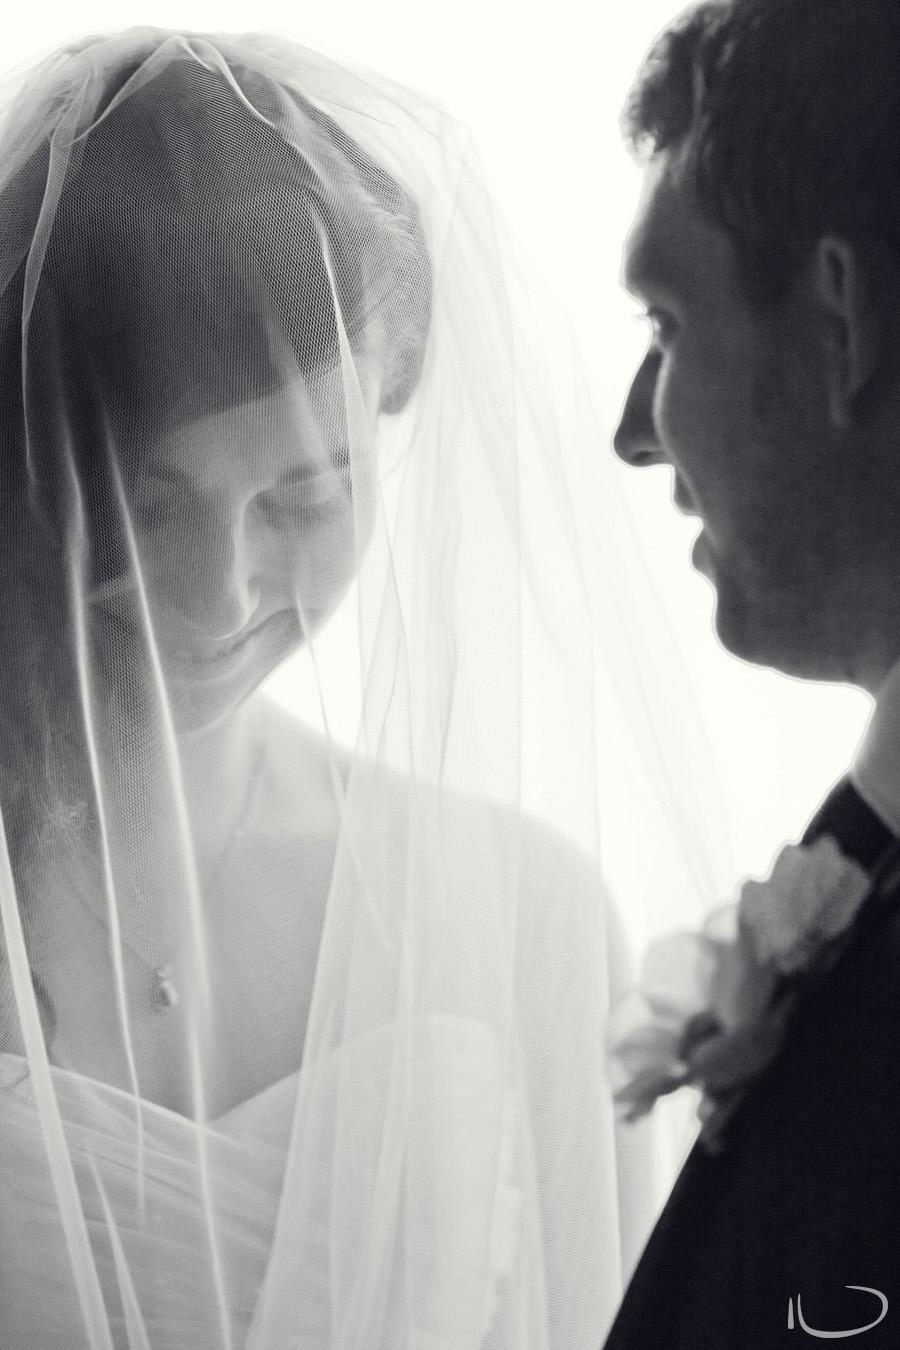 Gunners Barracks Wedding Photographer: Bride & groom during ceremony